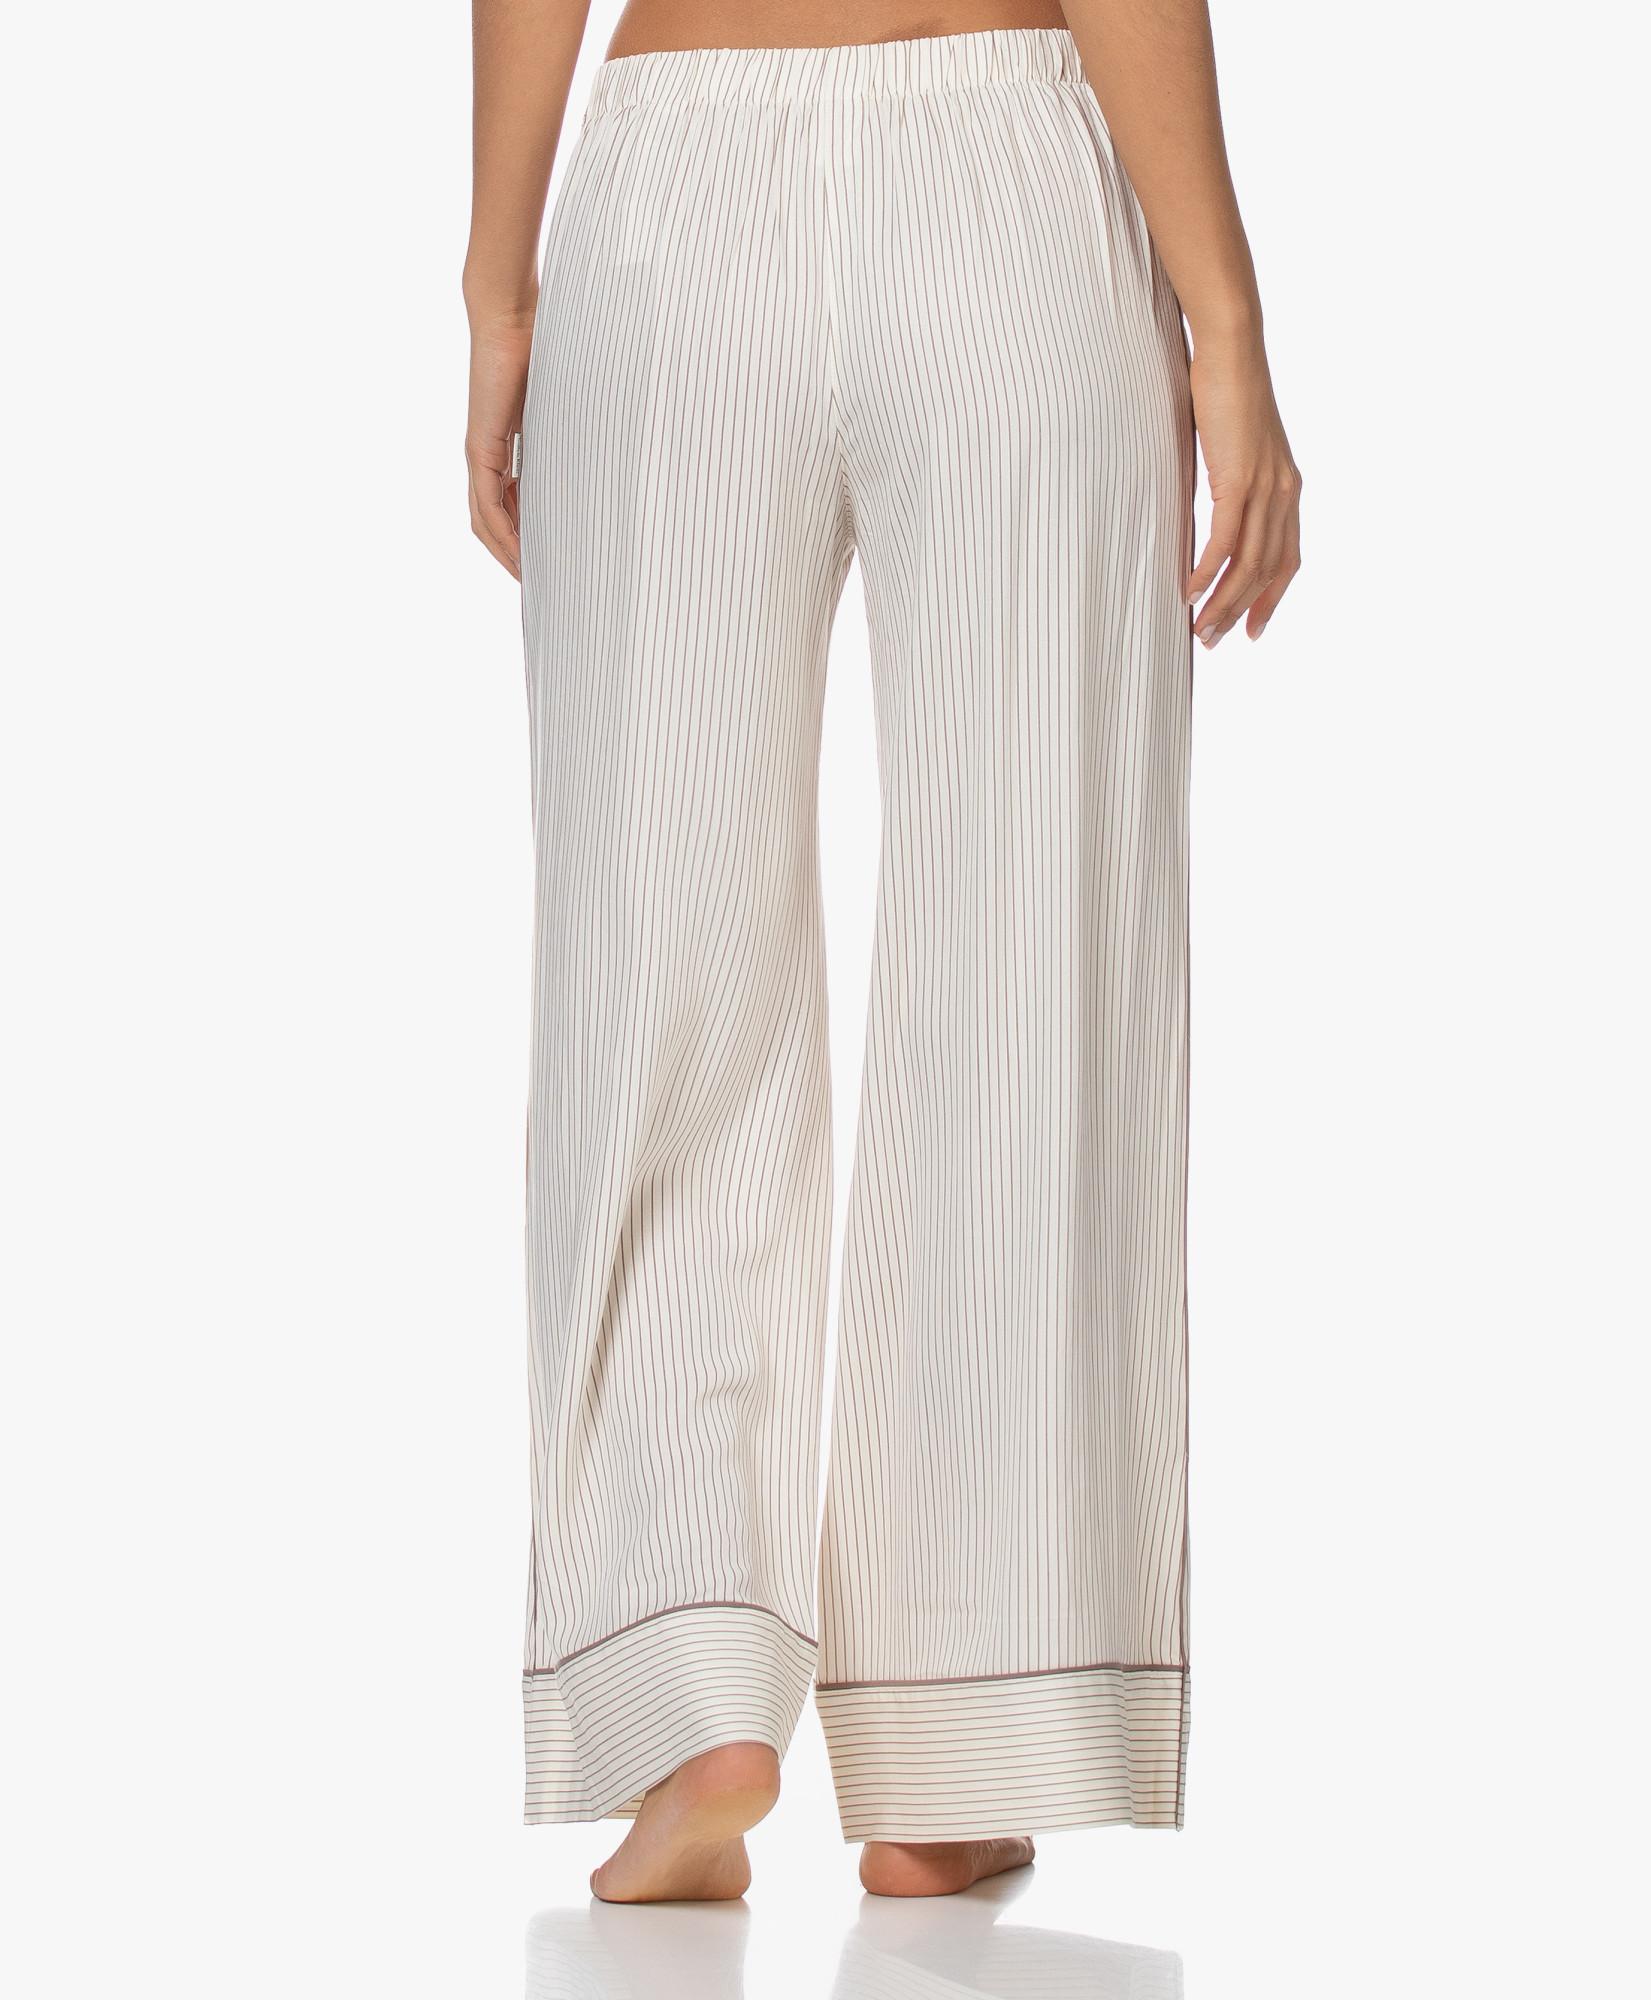 Dámske pyžamové nohavice QS6375E-SMH béžová - Calvin Klein béžová L